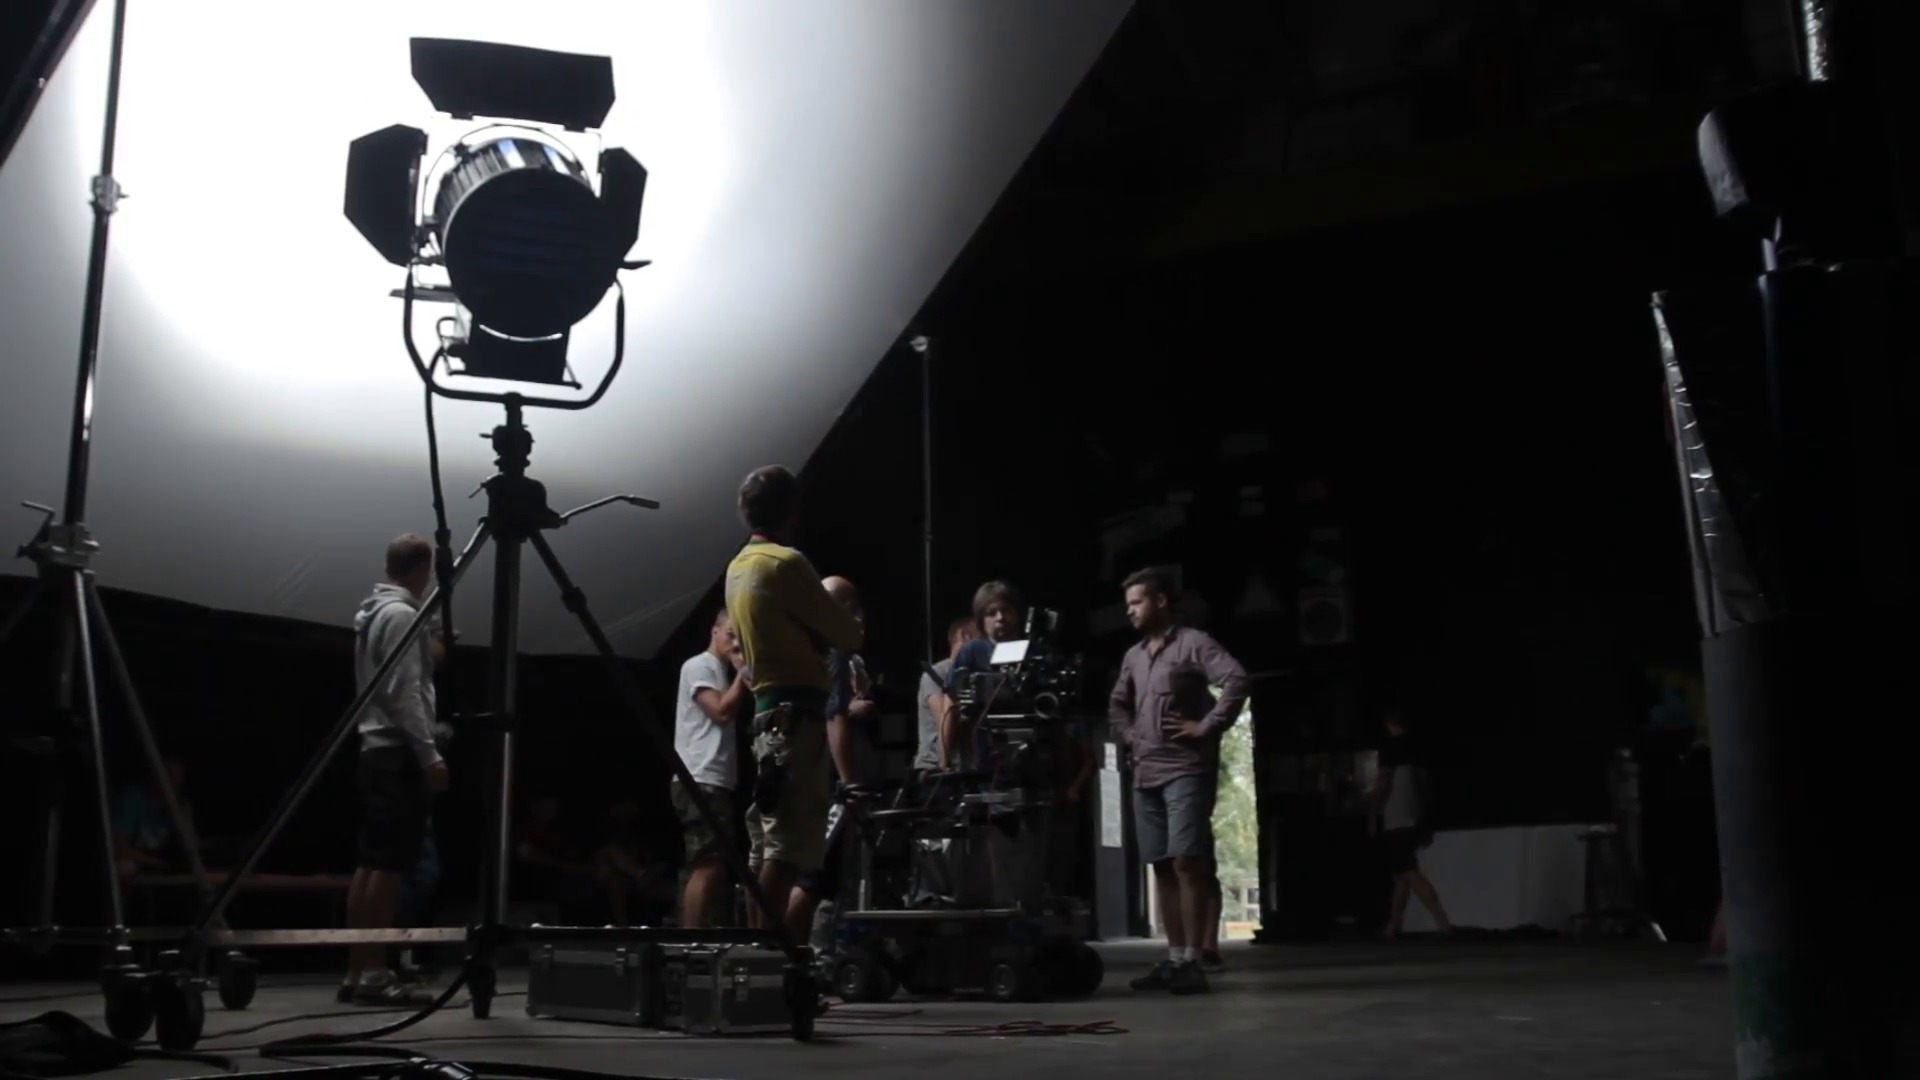 Съёмочная группа на площадке